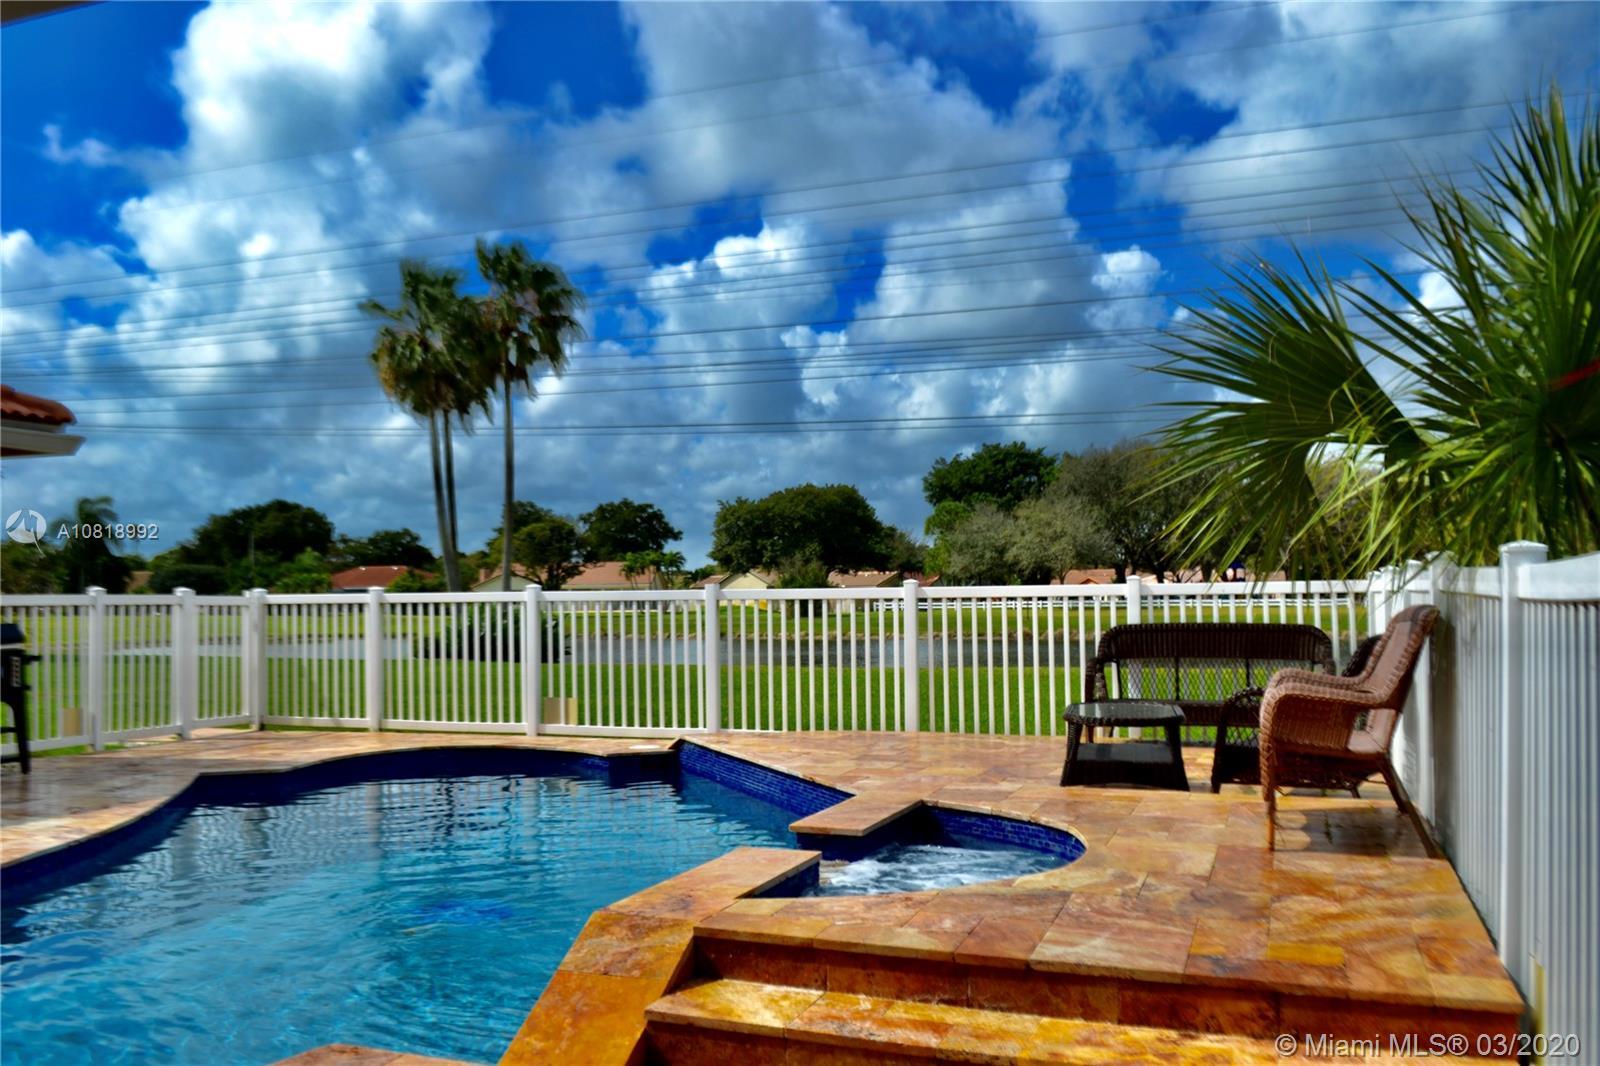 4384 NW 67th Way, Coral Springs, FL 33067 - Coral Springs, FL real estate listing